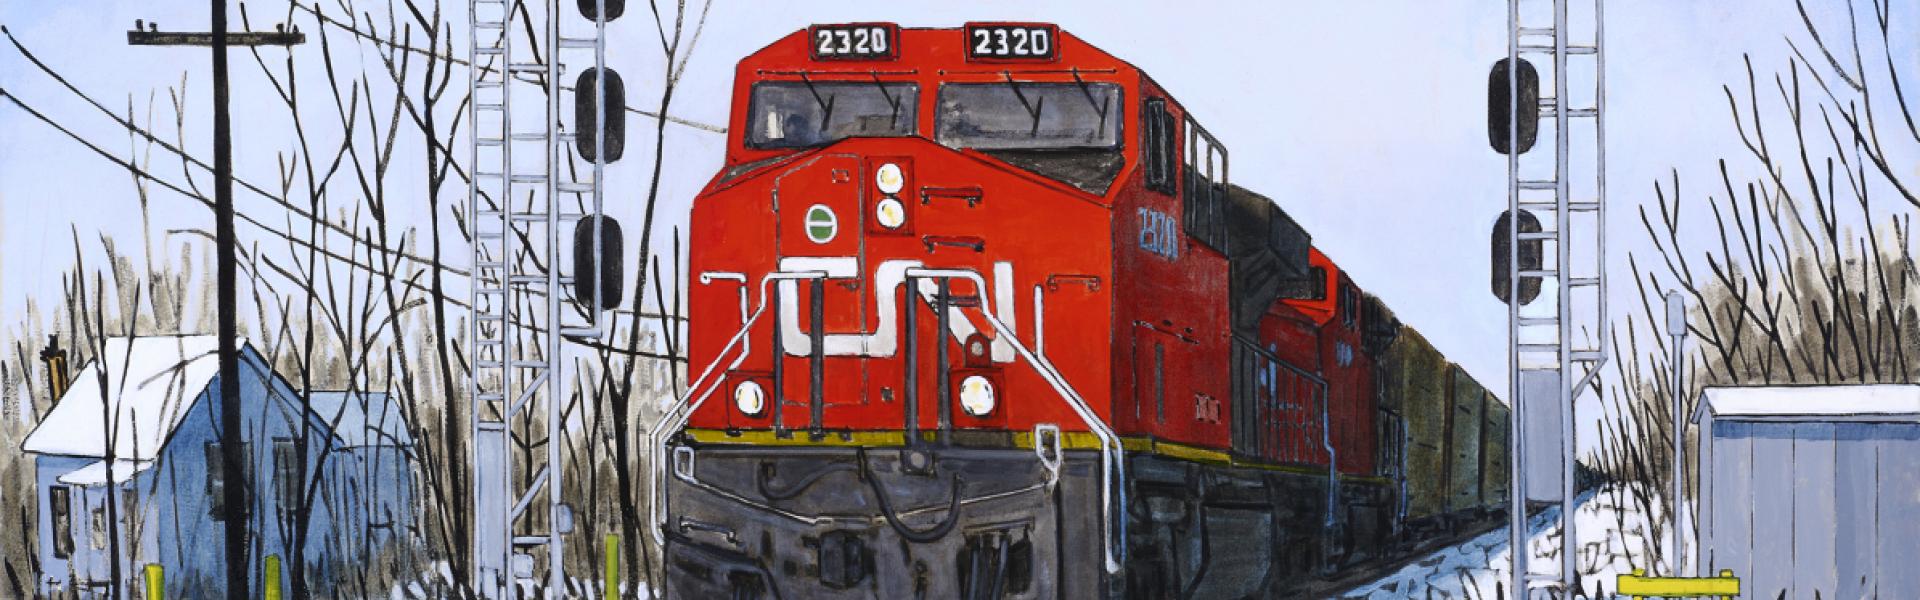 banner_Peer-RailwayBelleville.20210518122857.jpg